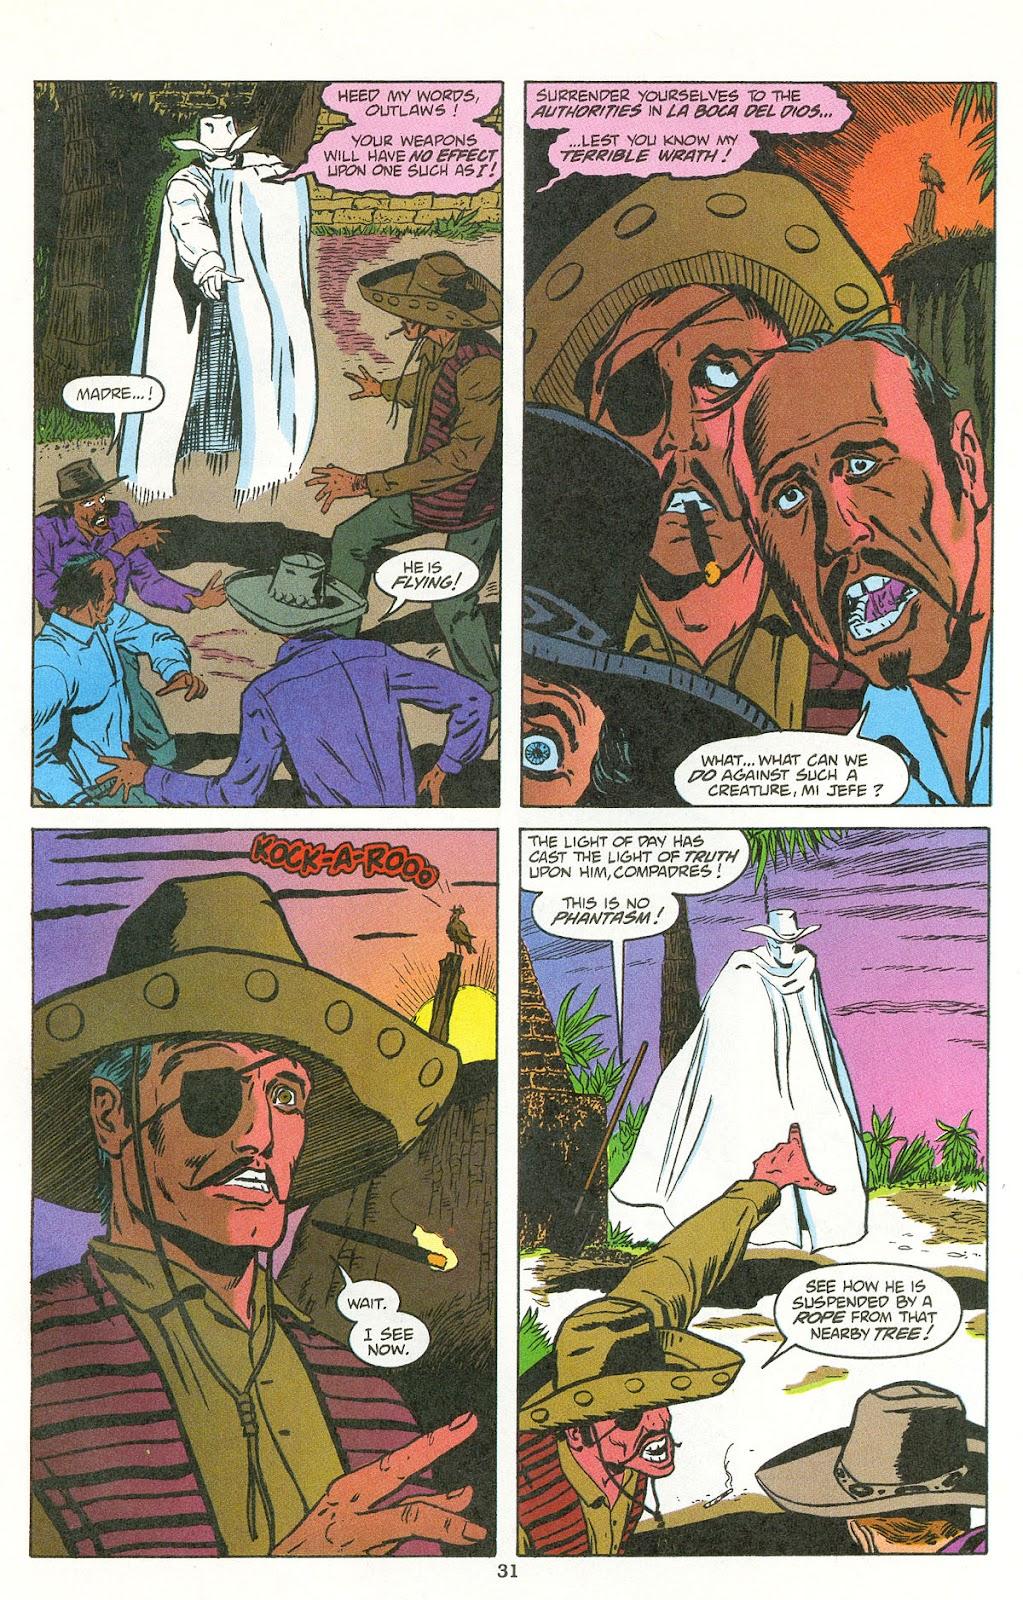 Comic The Original Ghost Rider issue 17